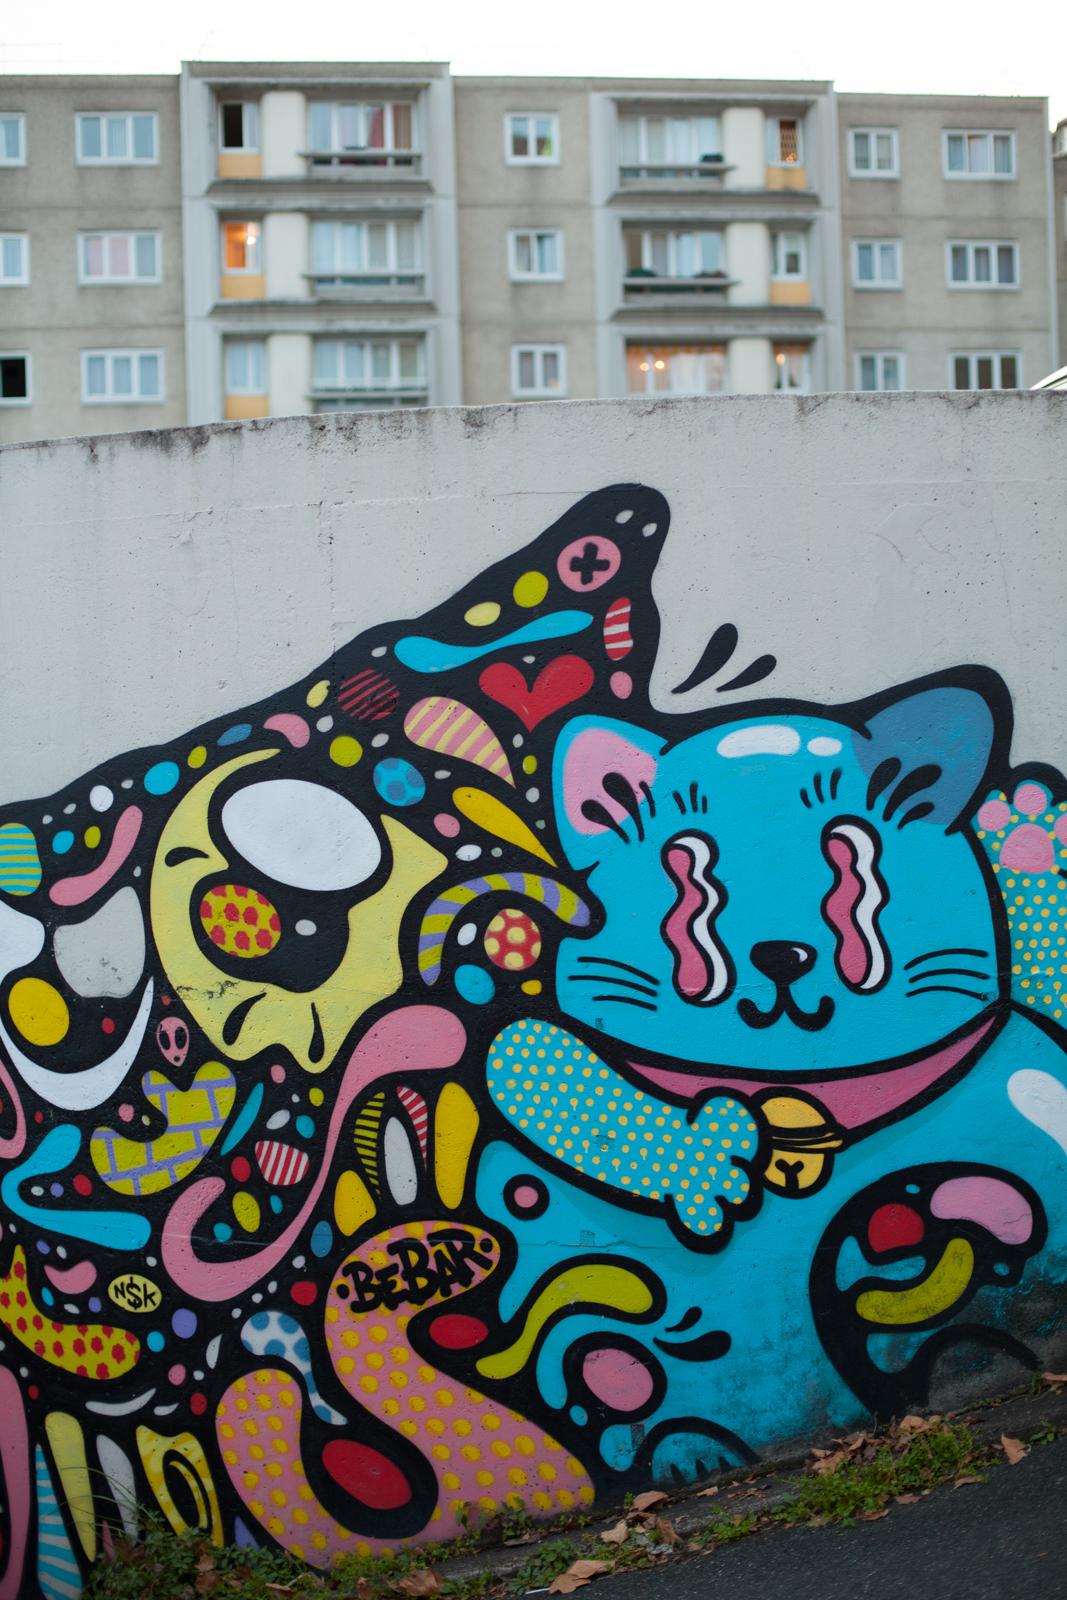 Lalasaïdko, bebar, street art vitry-sur-seine, street art vitry, street art val-de-marne, street art banlieue paris, art urbain vitry, art urbain vitry-sur-seine, art urbain vitry, le guide du street art à paris, stéphanie lombard